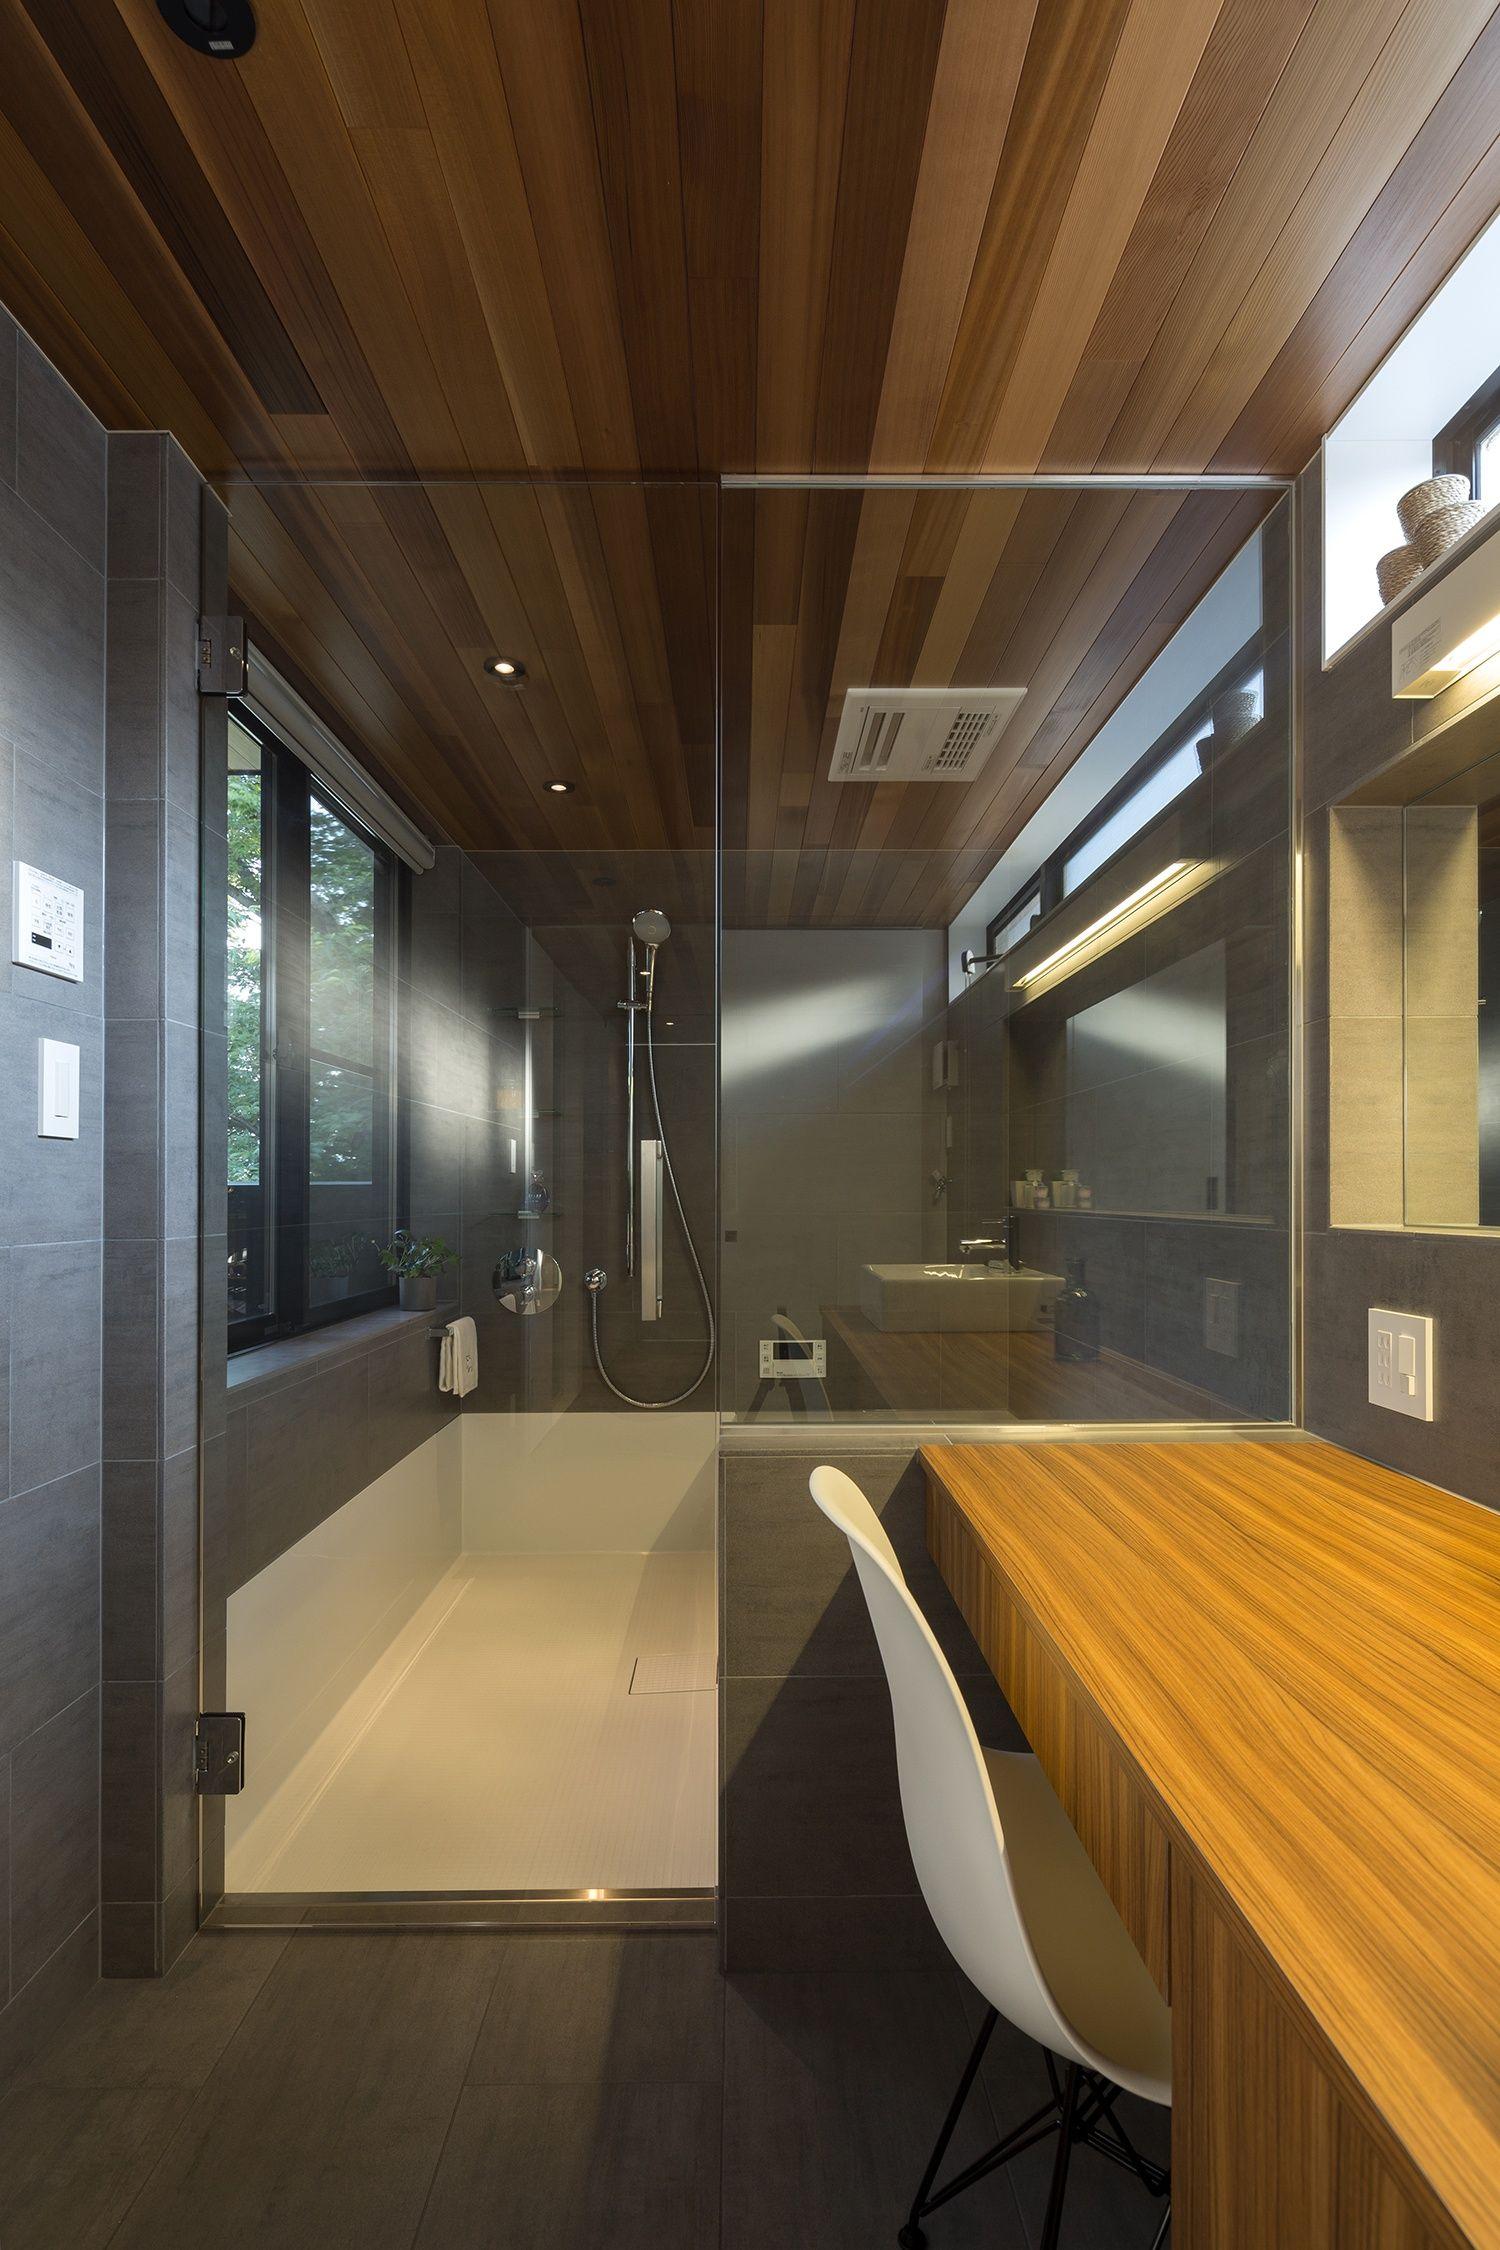 Ot House バス 浴室 重量木骨の家 選ばれた工務店と建てる木造注文